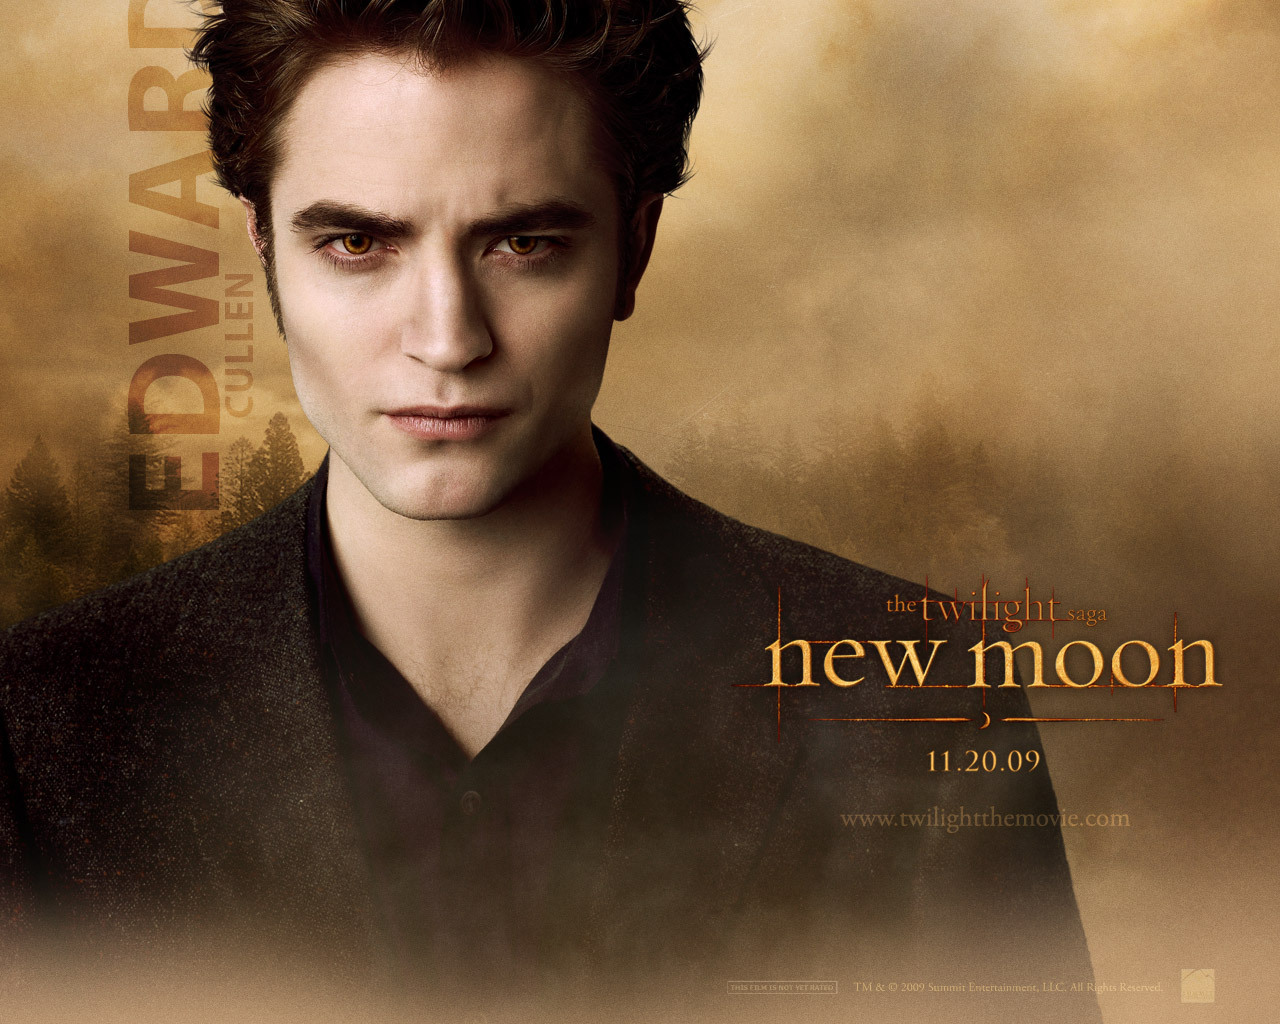 http://2.bp.blogspot.com/_C50LhC3RirQ/TPIGpwx-PiI/AAAAAAAAAgY/w5-HaZRLK8A/s1600/New-Moon-Edward-Cullen-twilight-saga_wallpaper.jpg